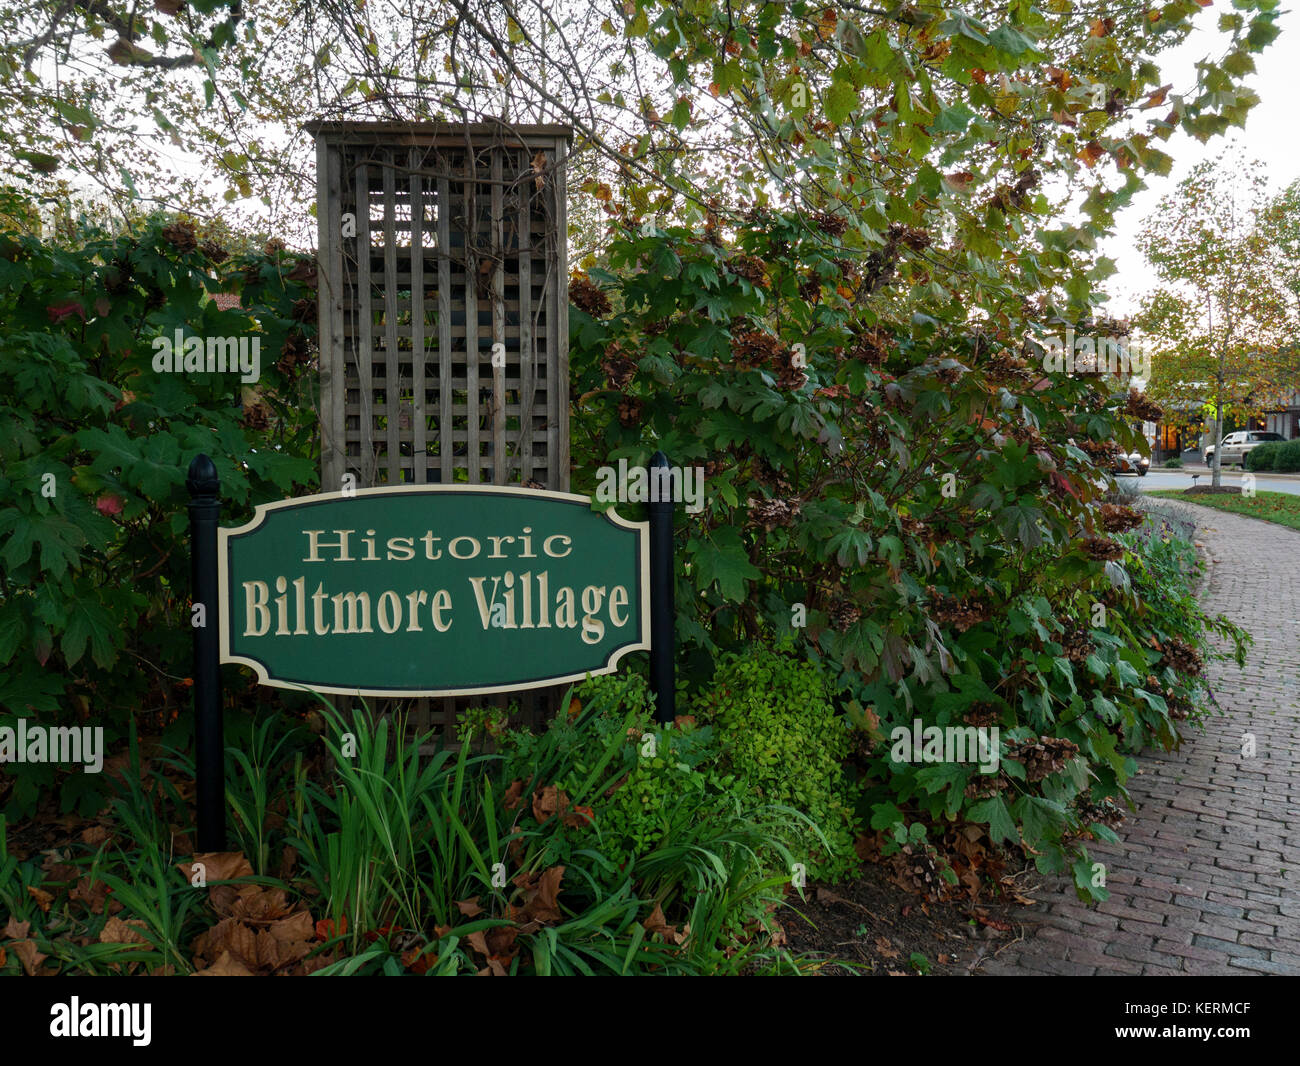 Historic Biltmore Village sign, Asheville, North Carolina. - Stock Image